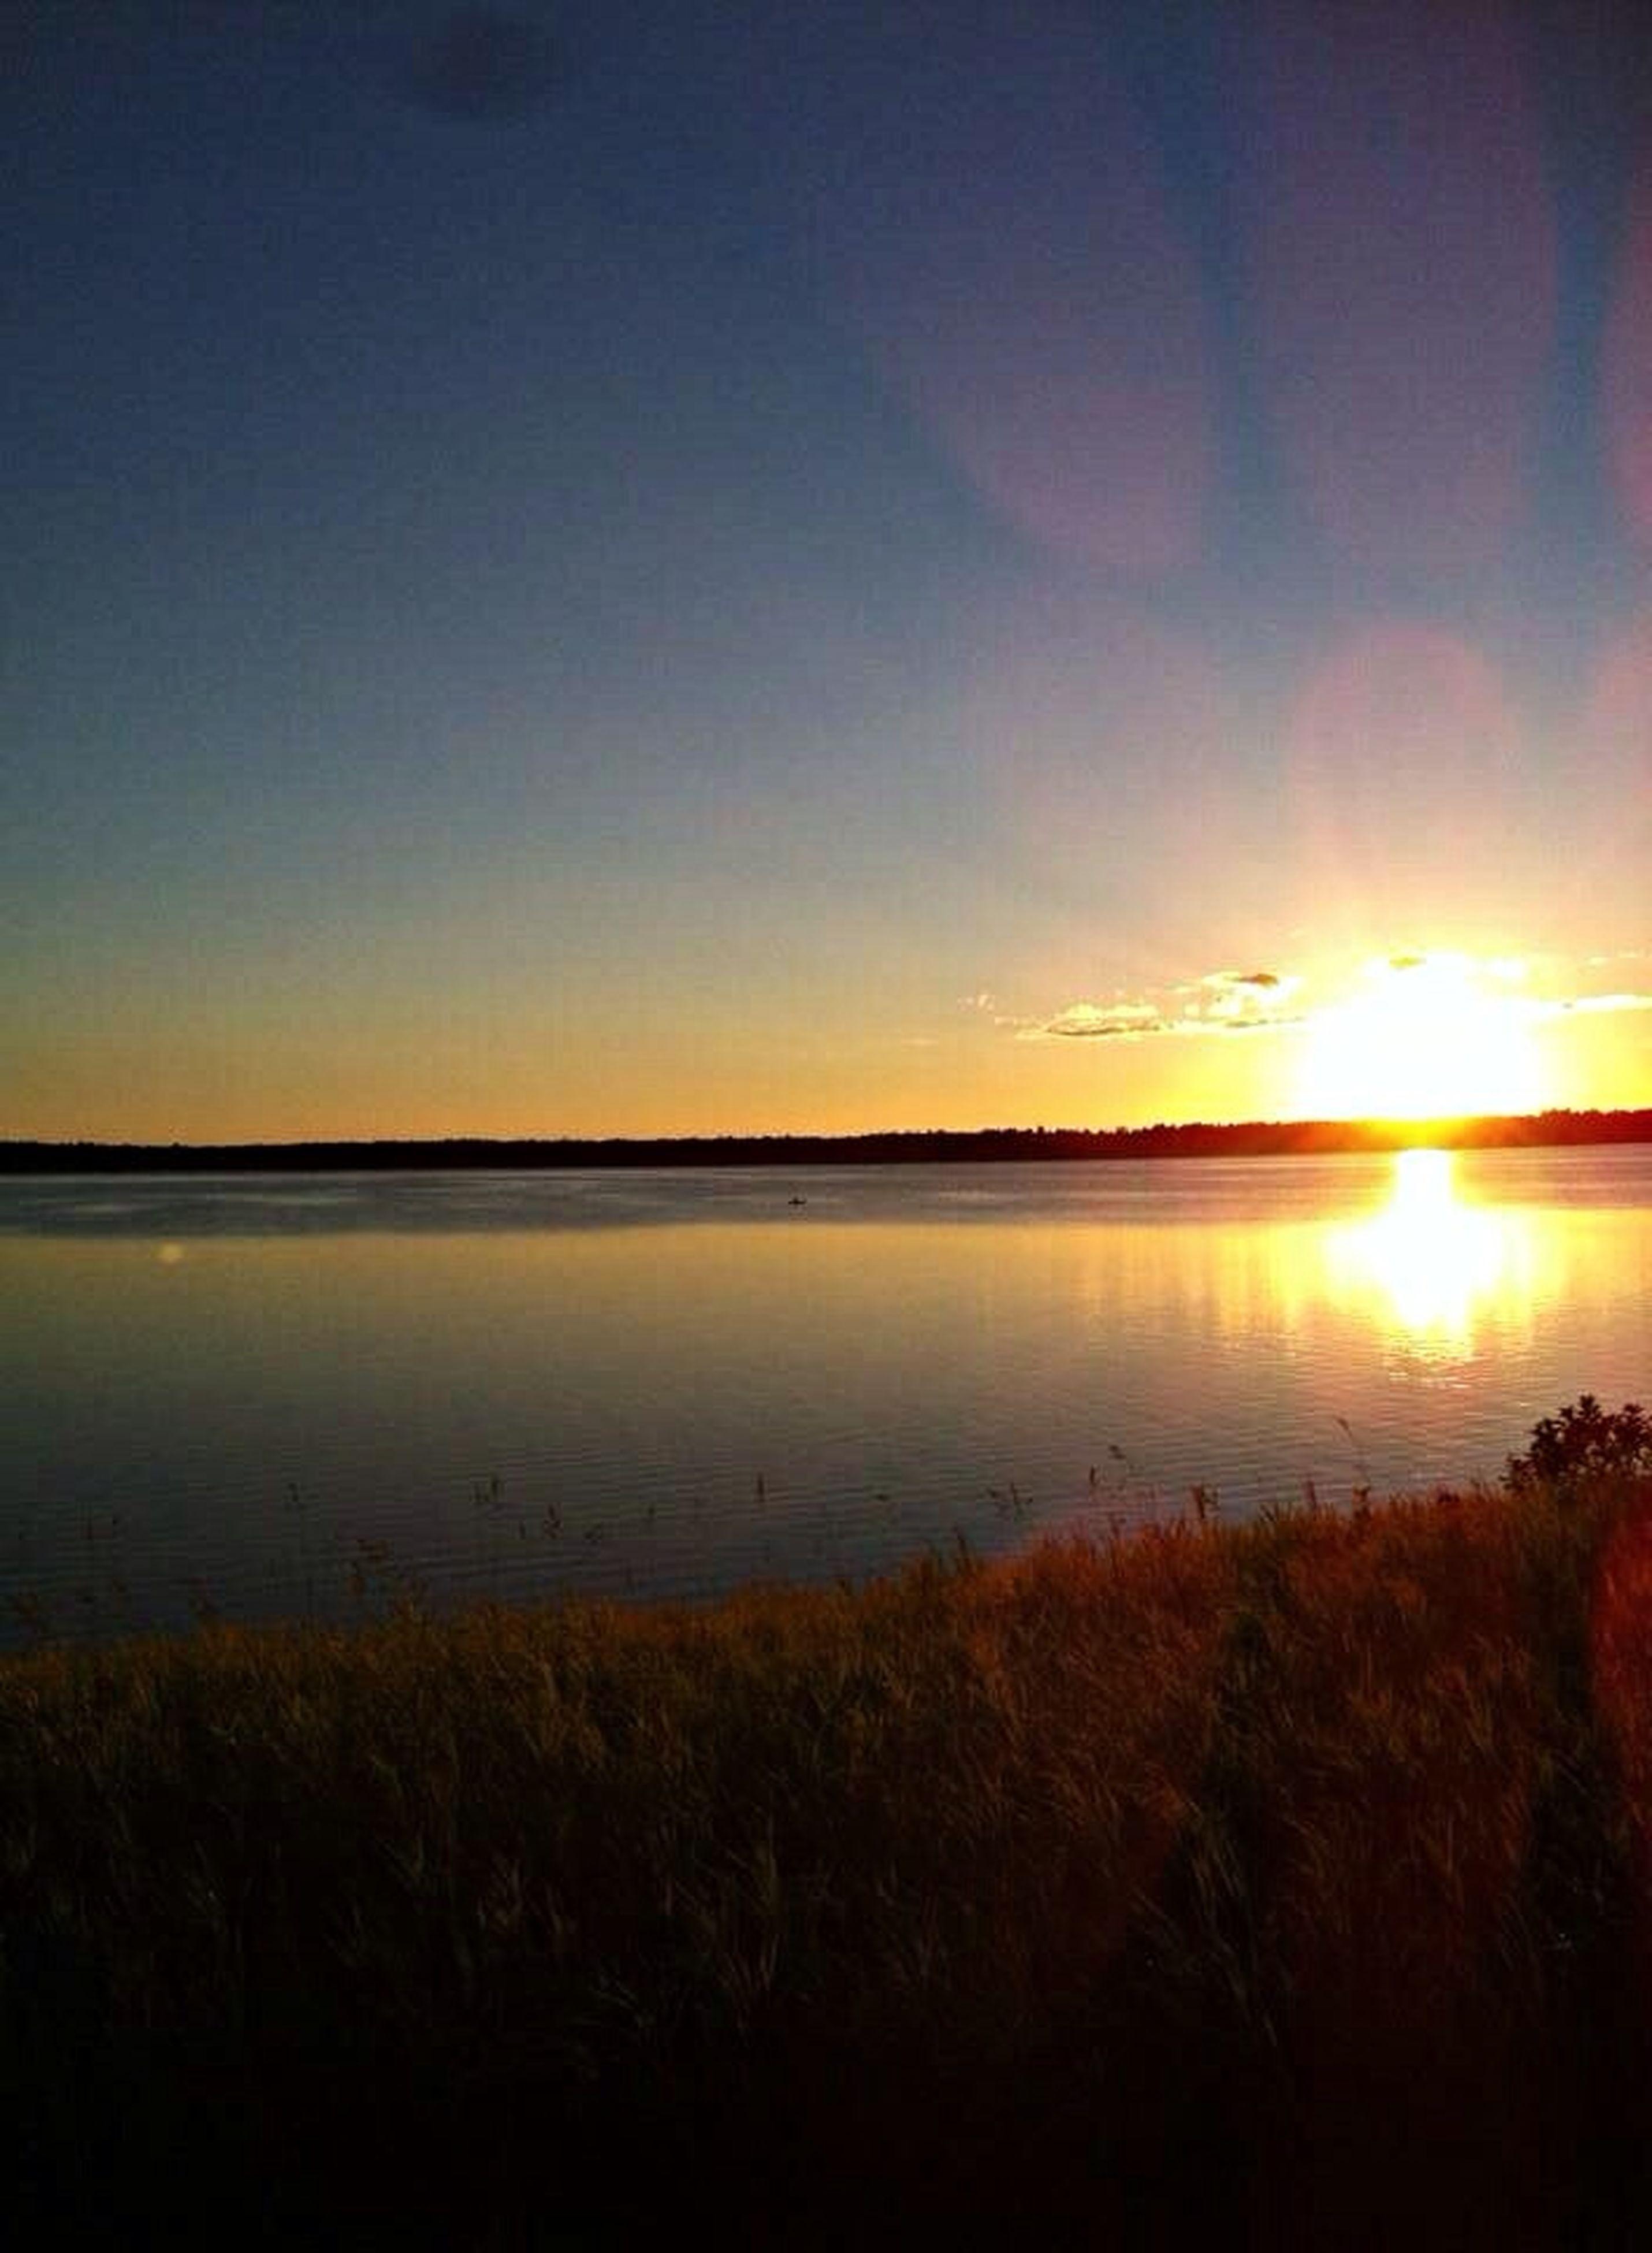 sunset, sun, tranquil scene, water, scenics, tranquility, beauty in nature, reflection, sky, sunlight, nature, sea, sunbeam, idyllic, lake, orange color, lens flare, silhouette, outdoors, beach